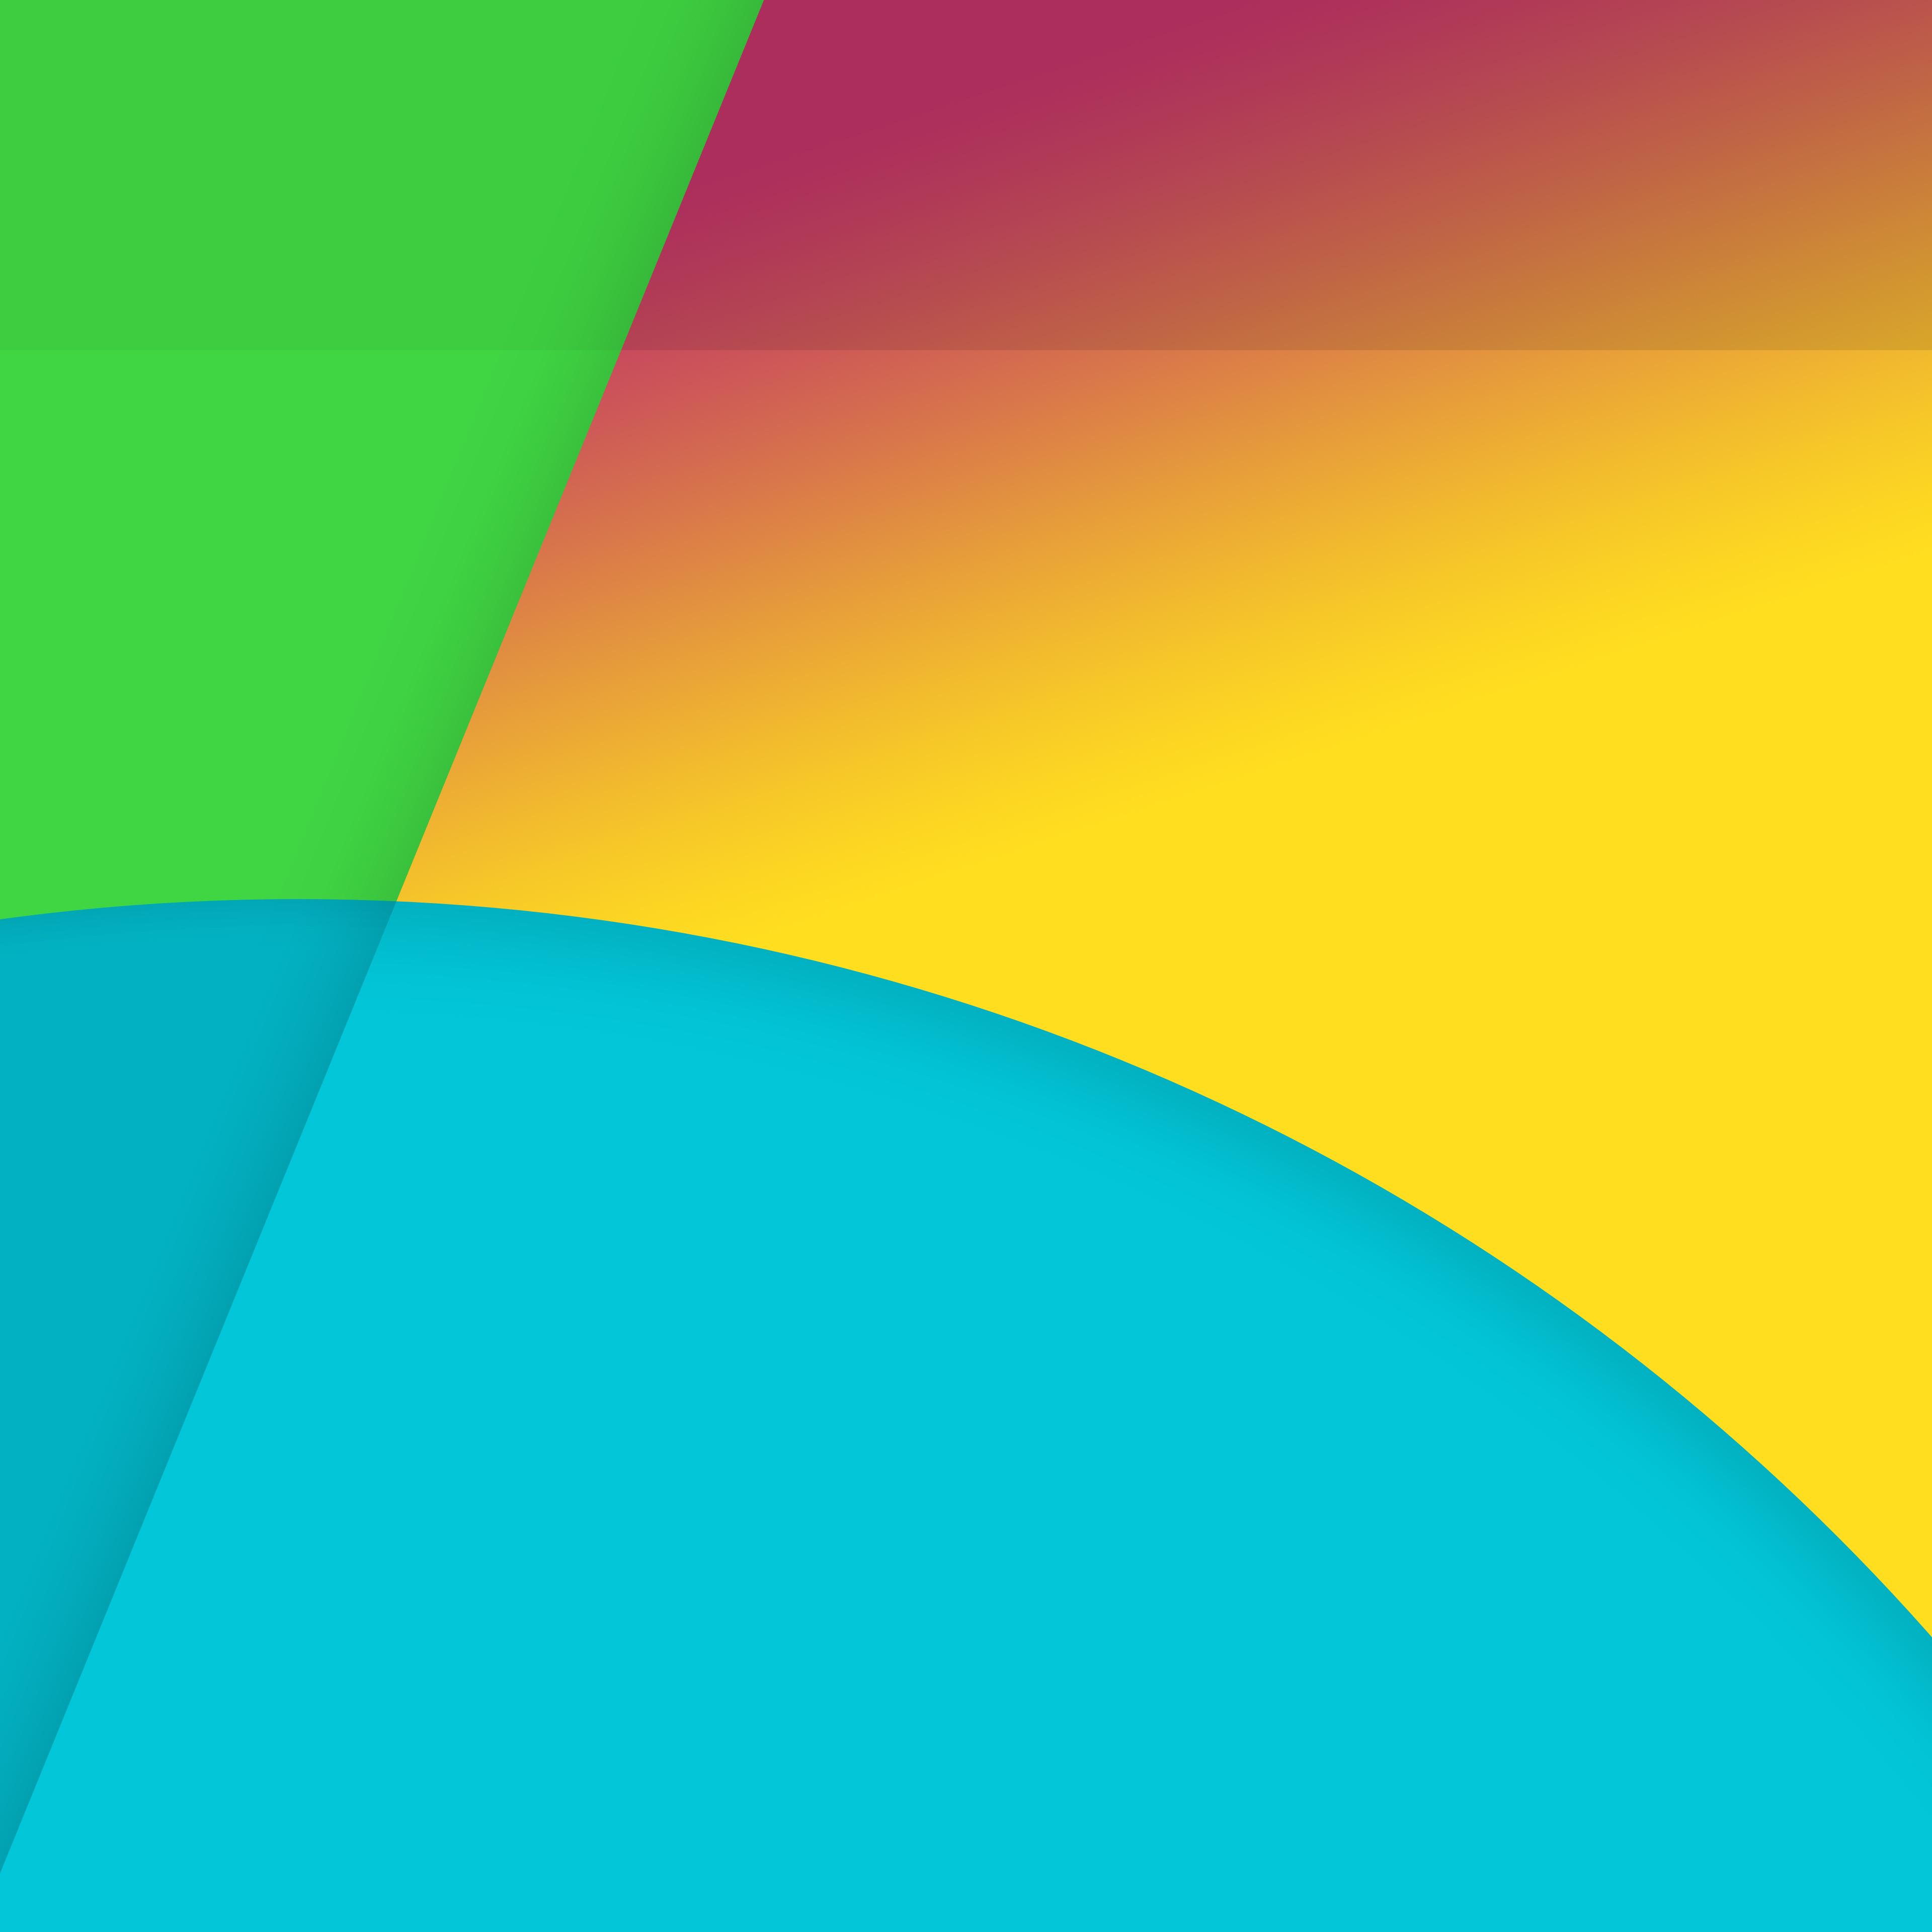 49+] Stock Android Wallpapers on WallpaperSafari